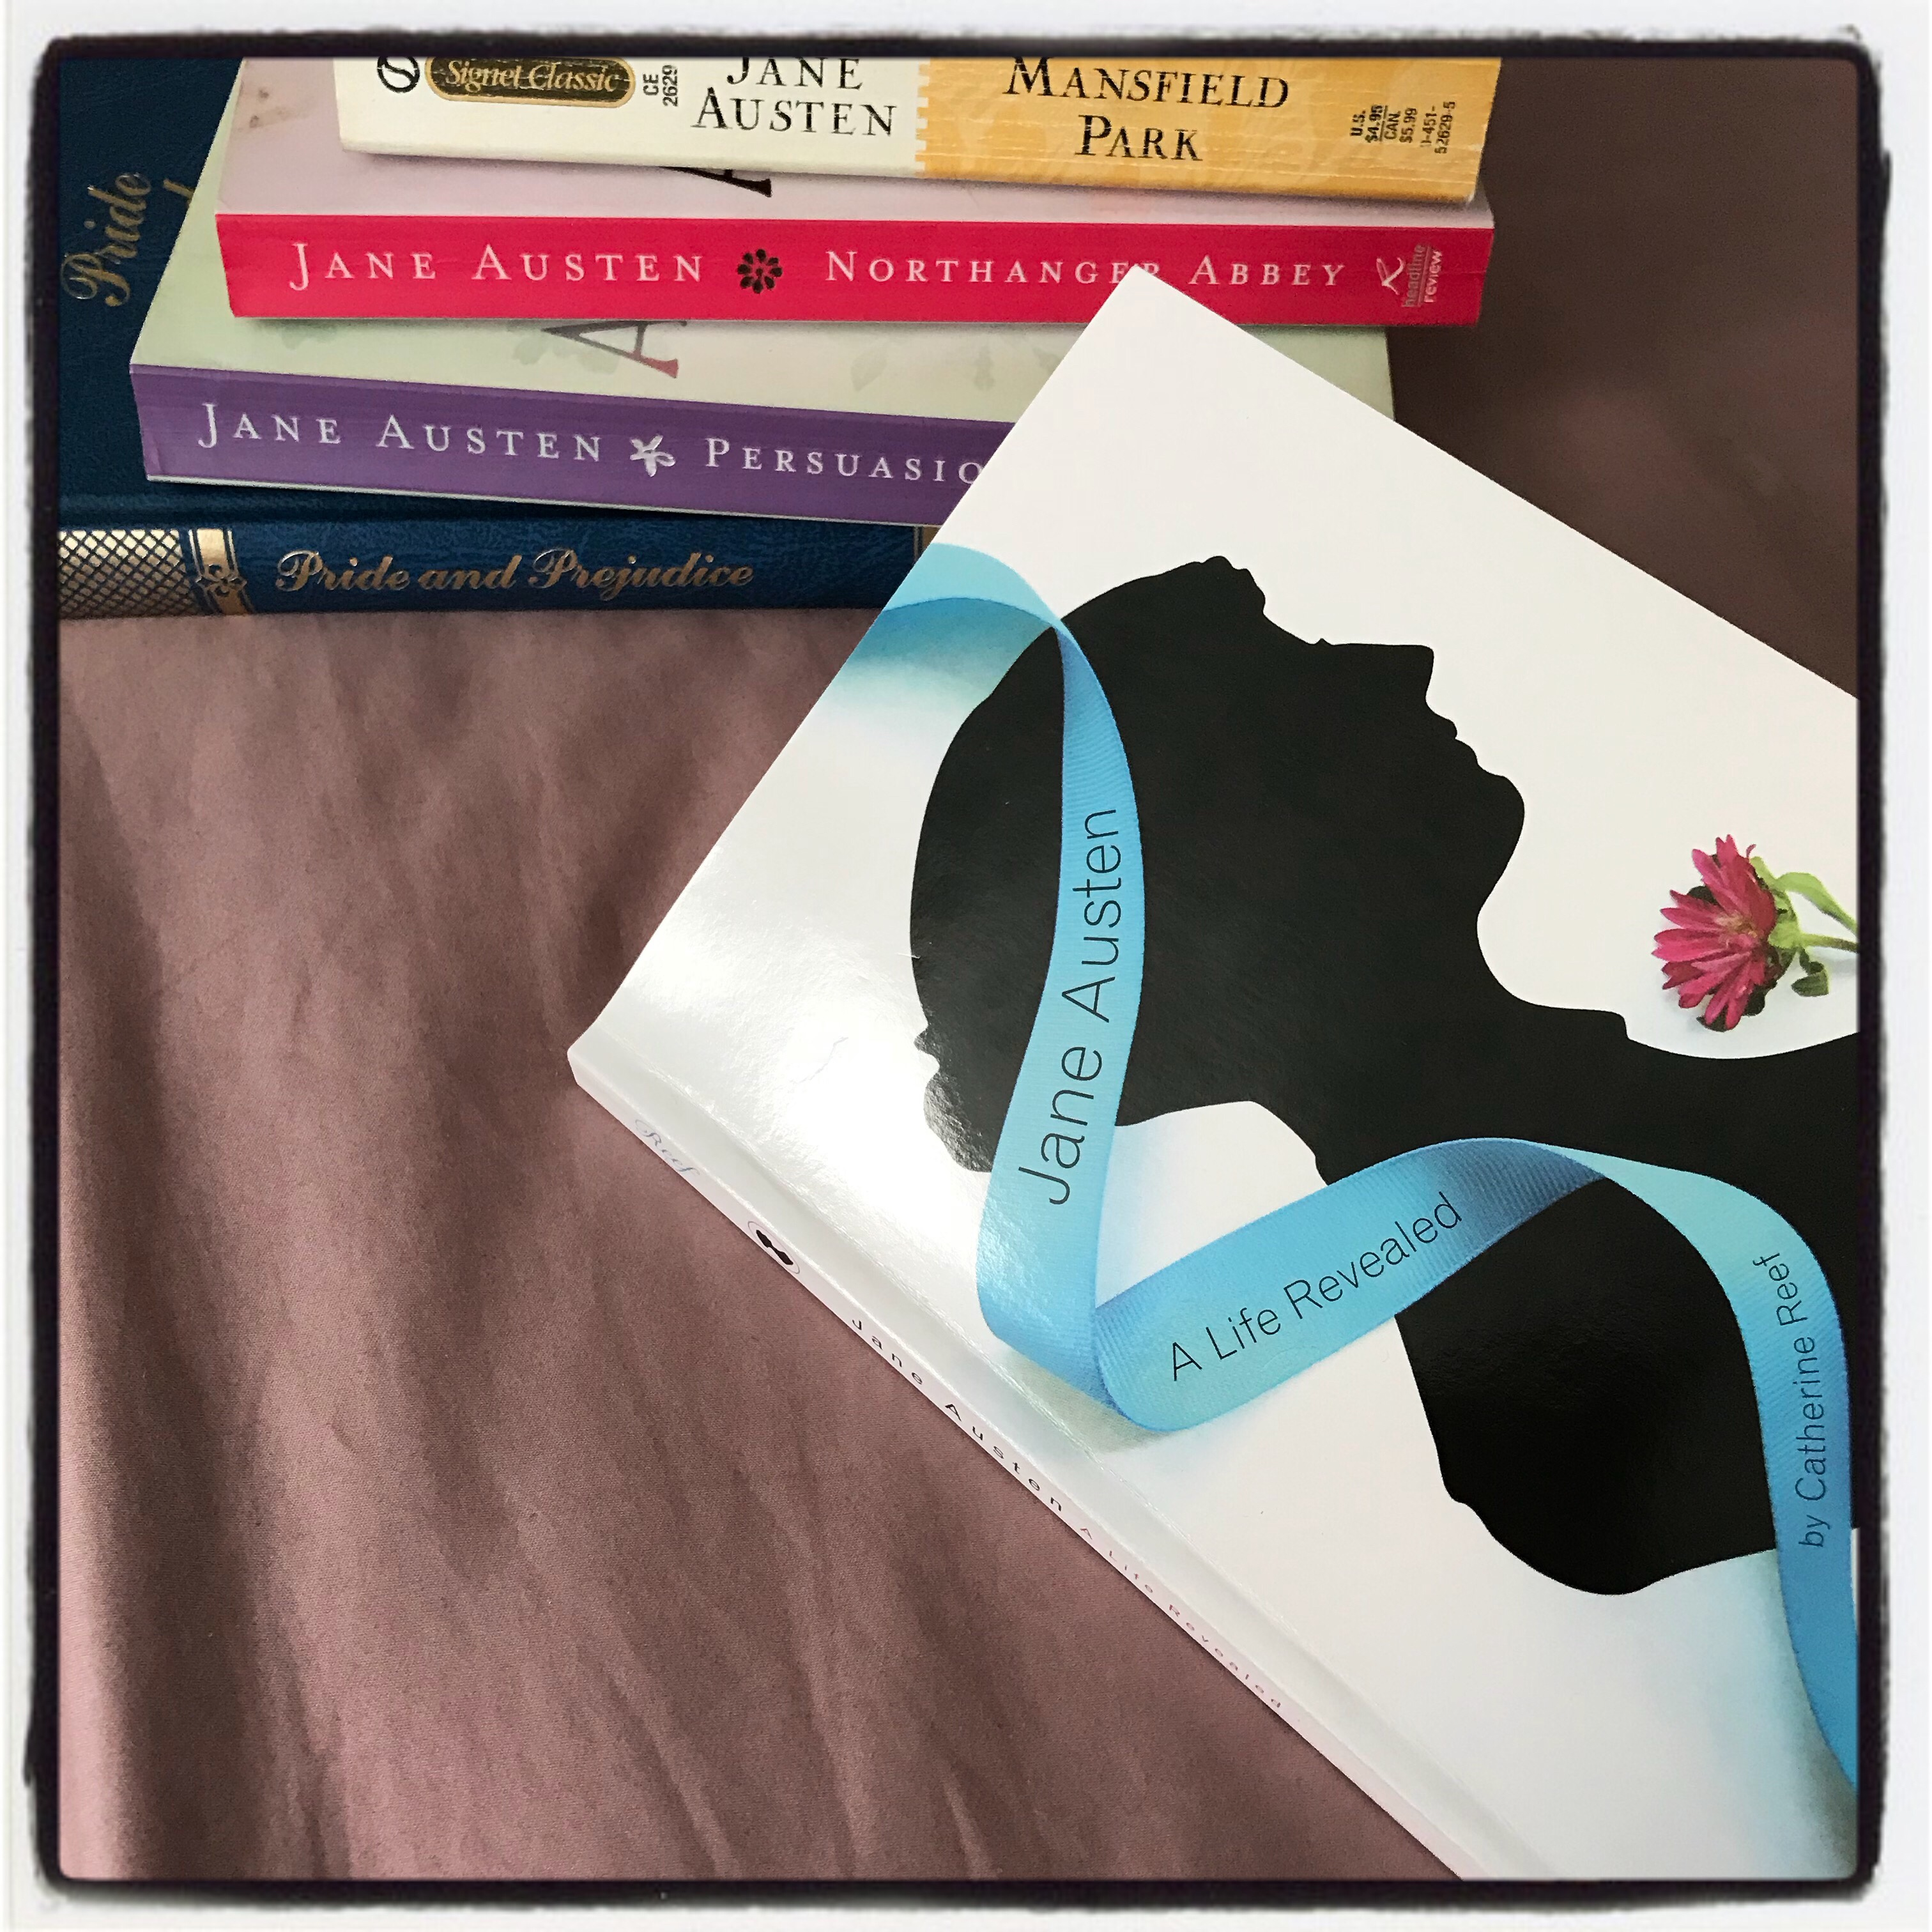 Jane Austen: A Life Revealed